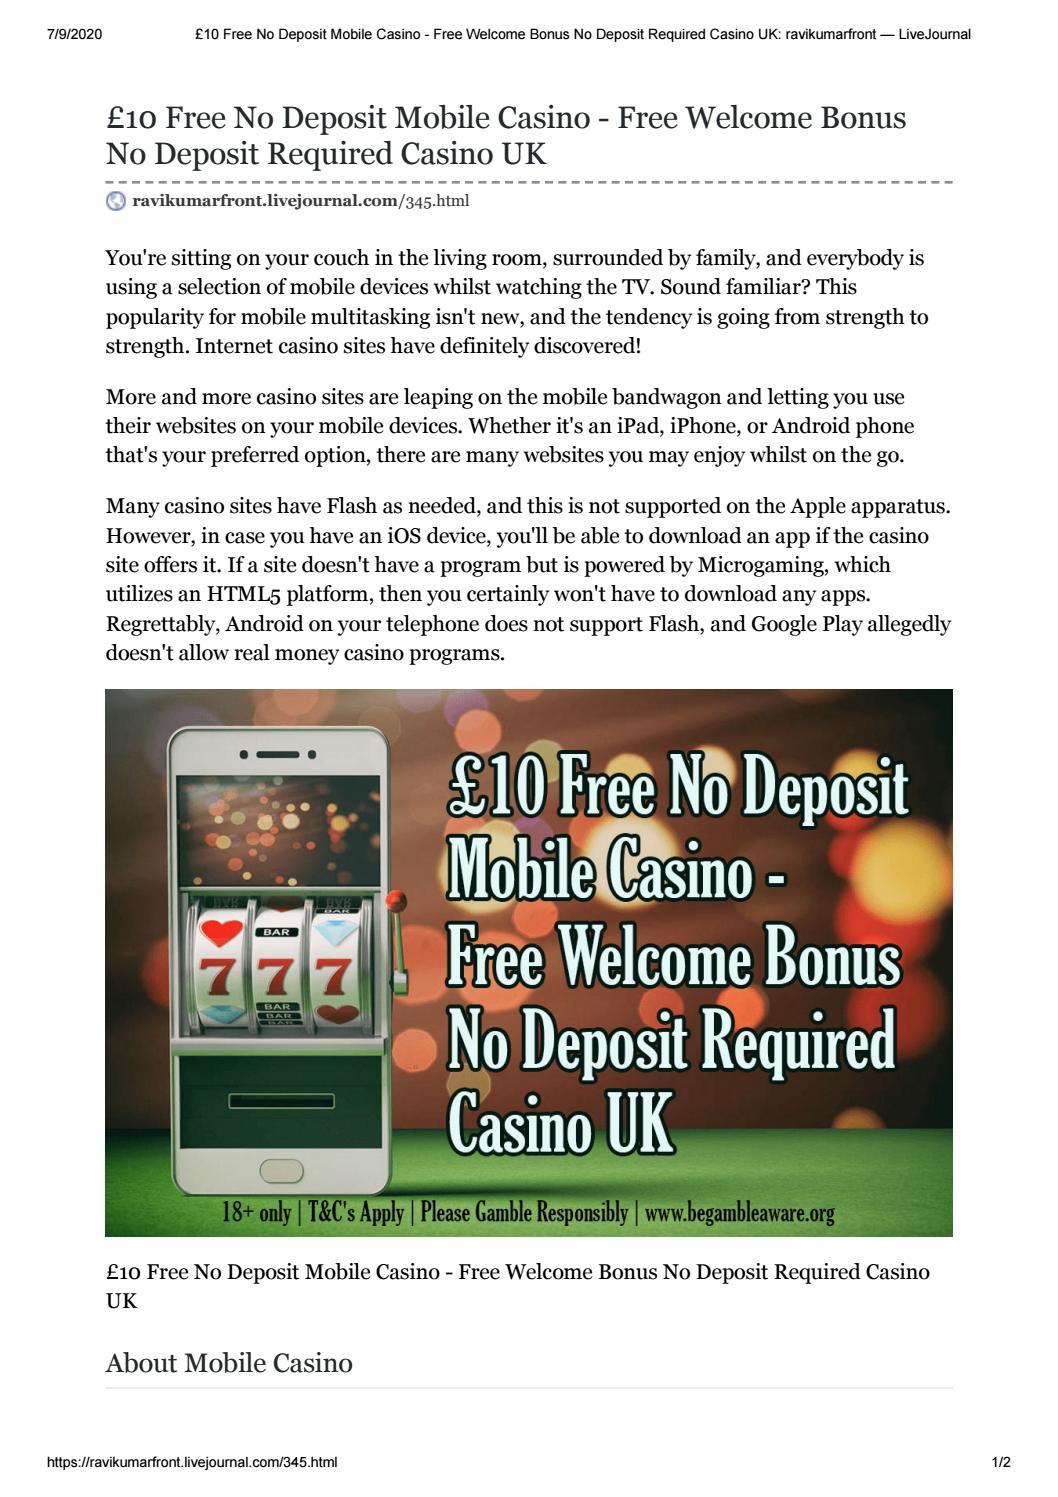 10 Free No Deposit Mobile Casino Free Welcome Bonus No Deposit Required Casino Uk By All Casino Site Issuu